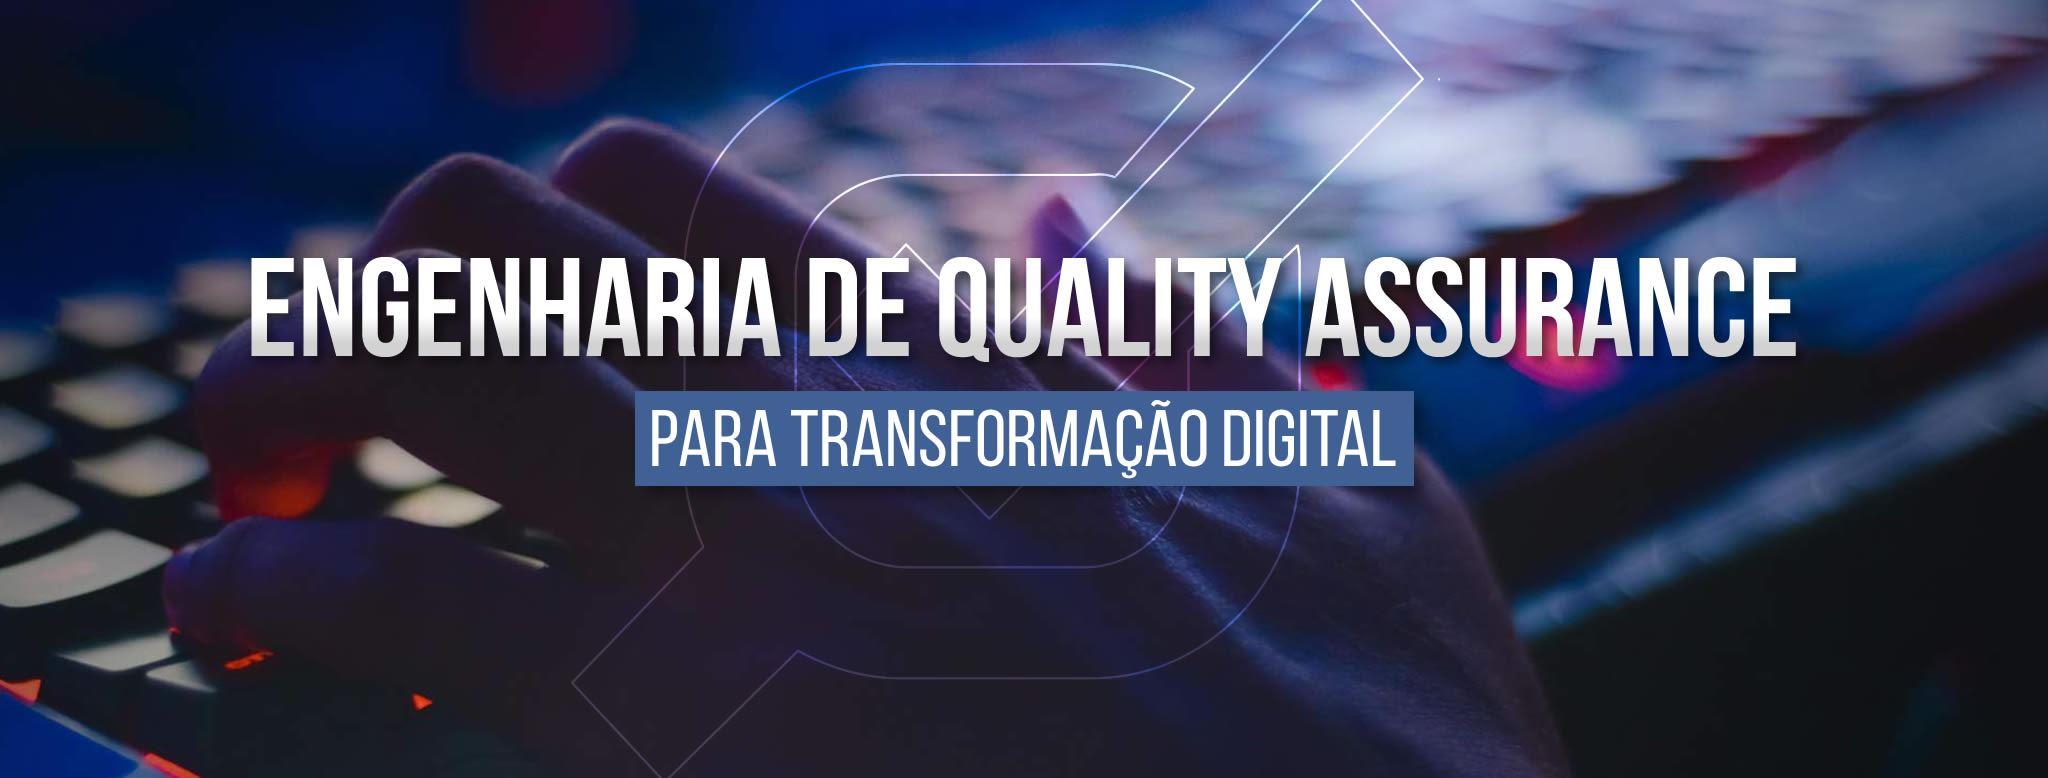 https://www.primecontrol.com.br/wp-content/uploads/2020/04/banner_home-engenharia-de-quality-assurance.jpg